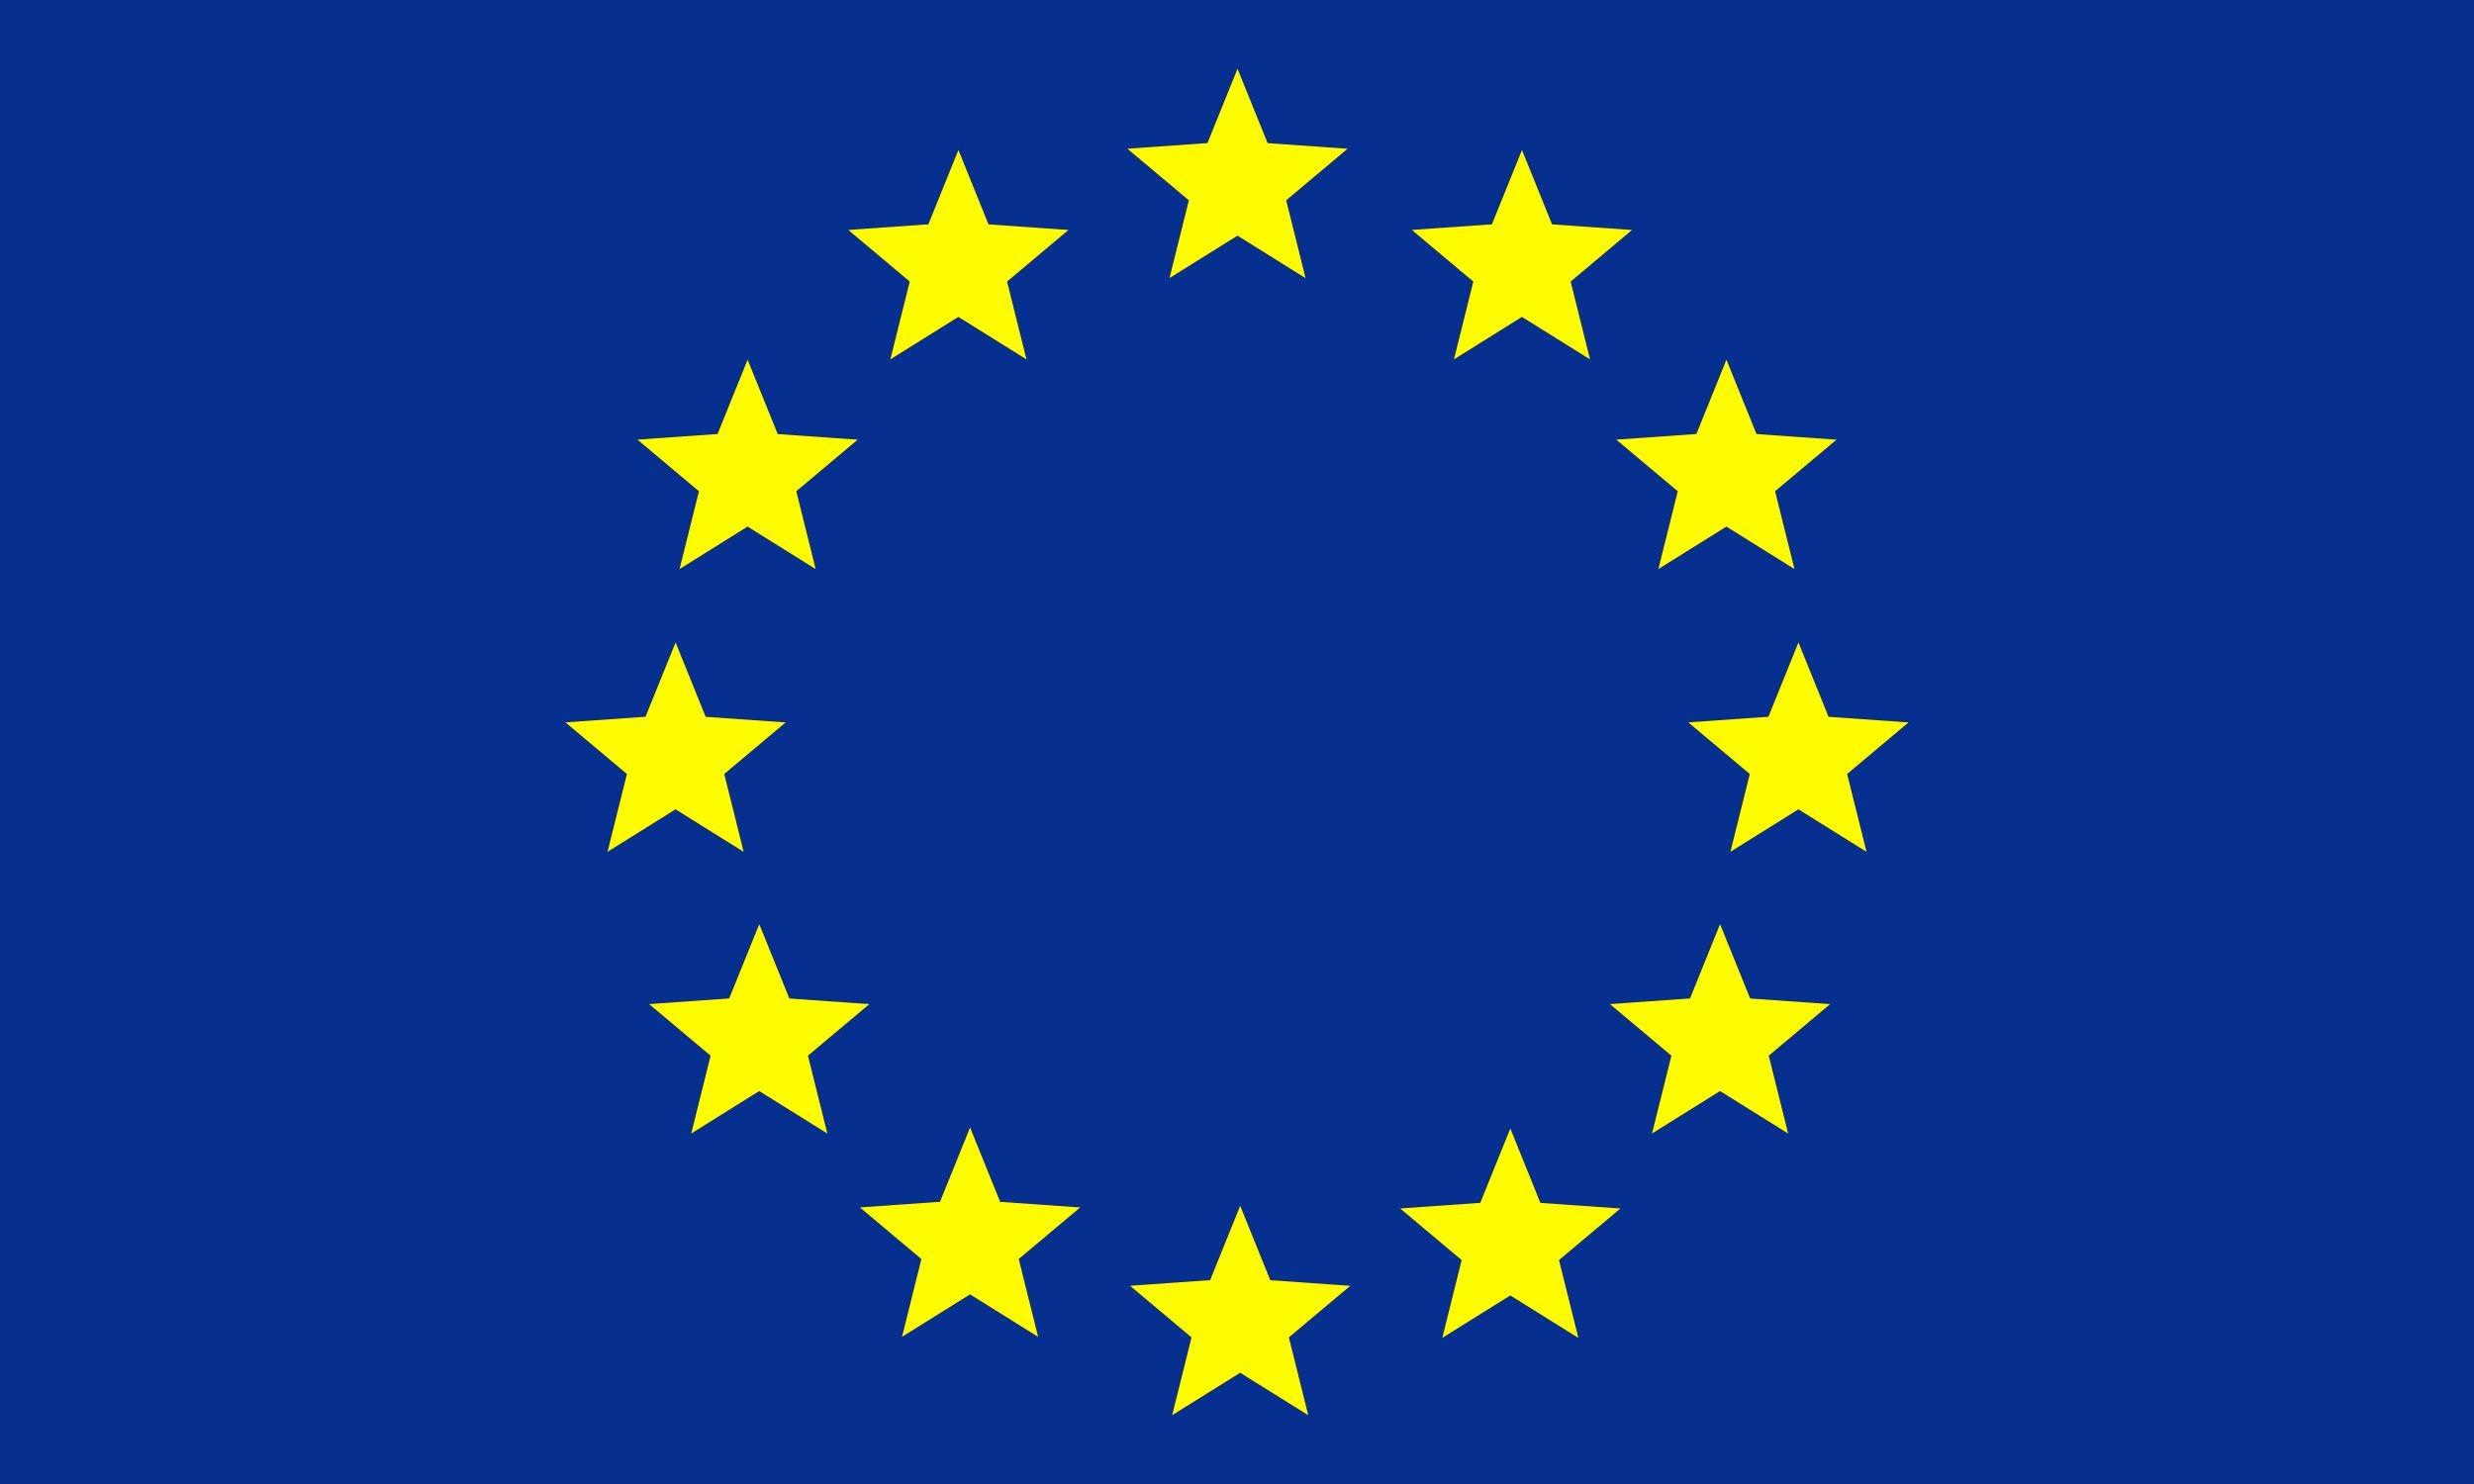 Aufkleber Flagge Europa 65 x 100 mm Deutschland Fanartikel Olympia – Bild 1